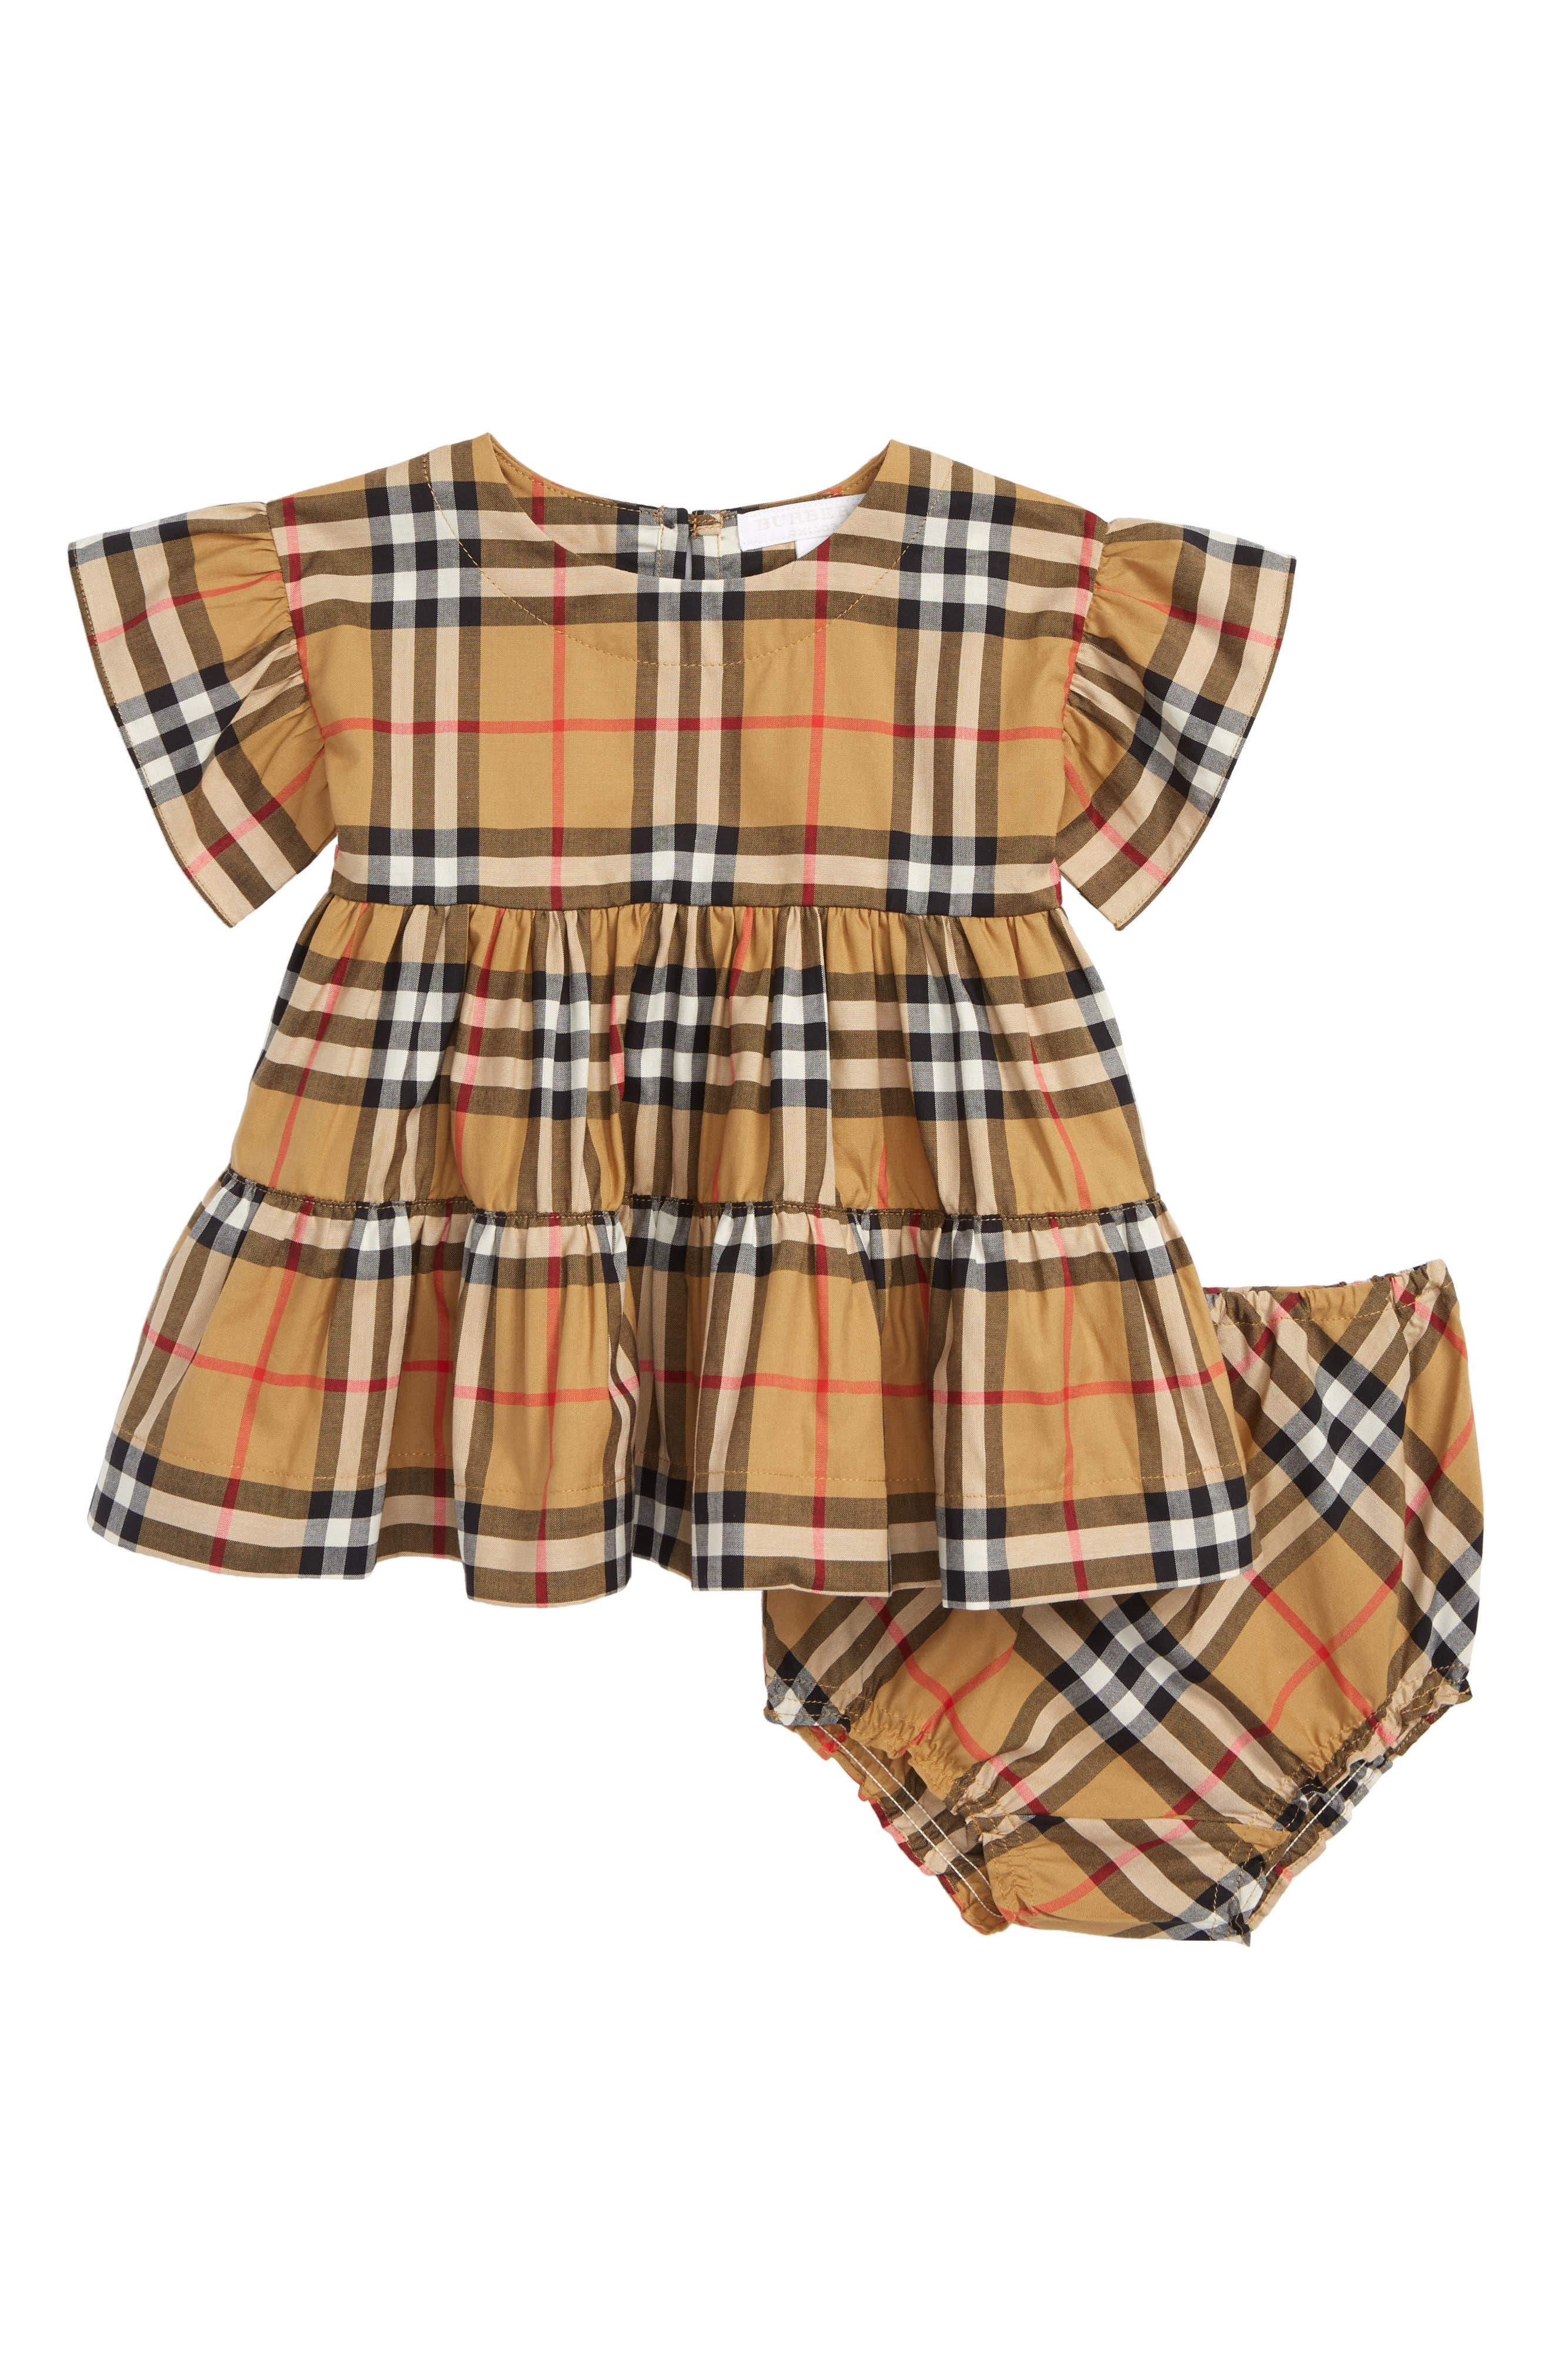 BURBERRY, Alima Check Dress, Main thumbnail 1, color, ANTIQUE YELLOW